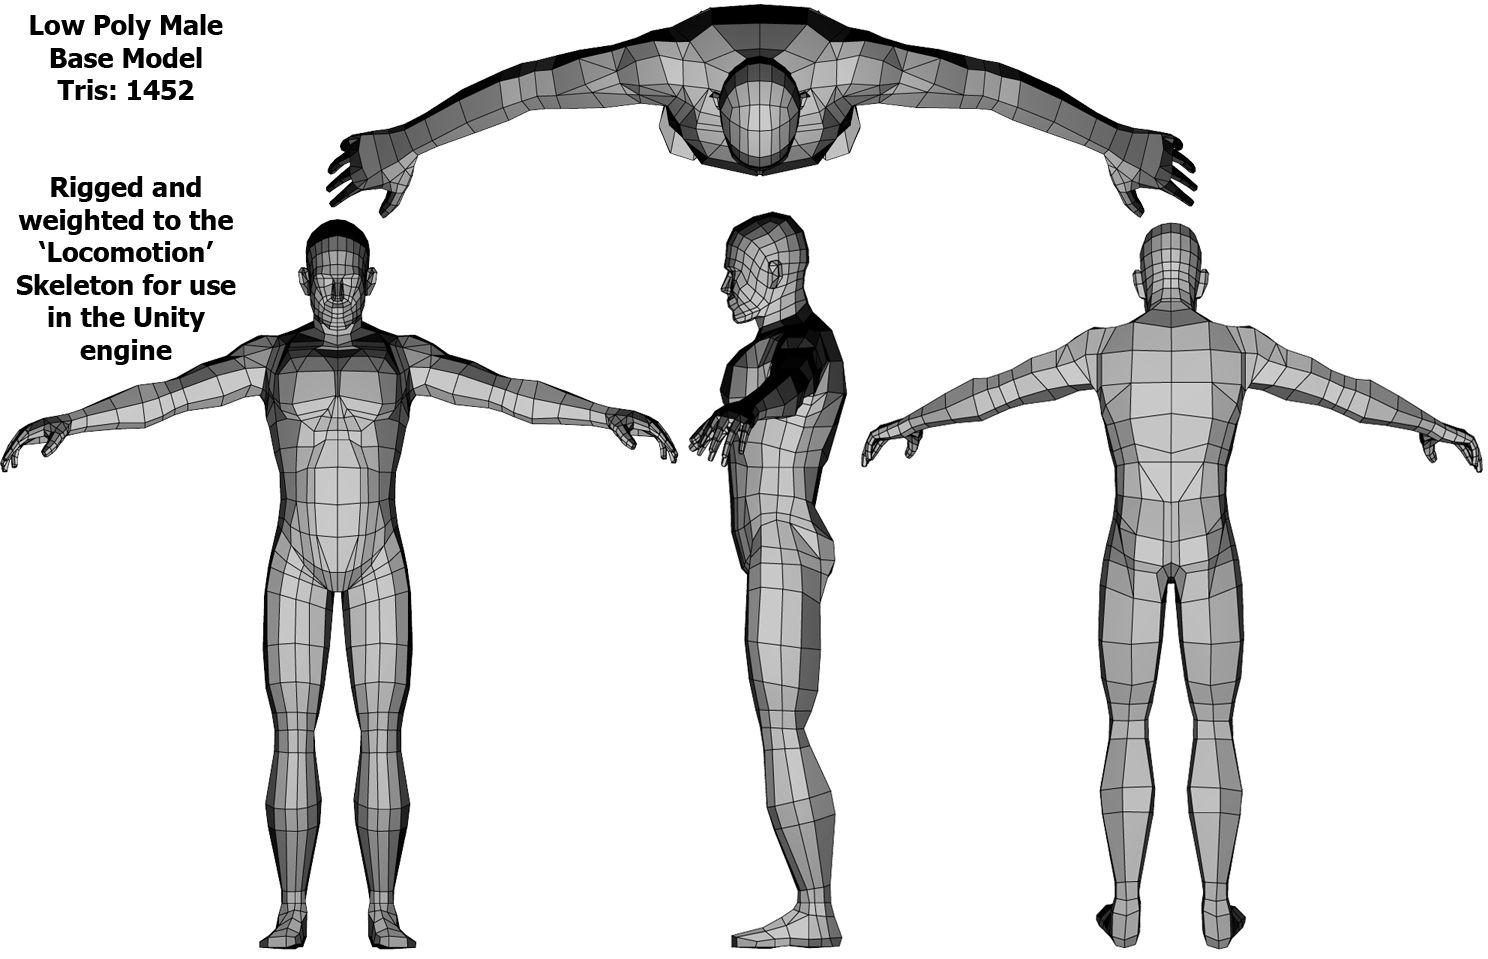 male model low poly | 3D - Skeleton/technique | Pinterest | Low poly ...